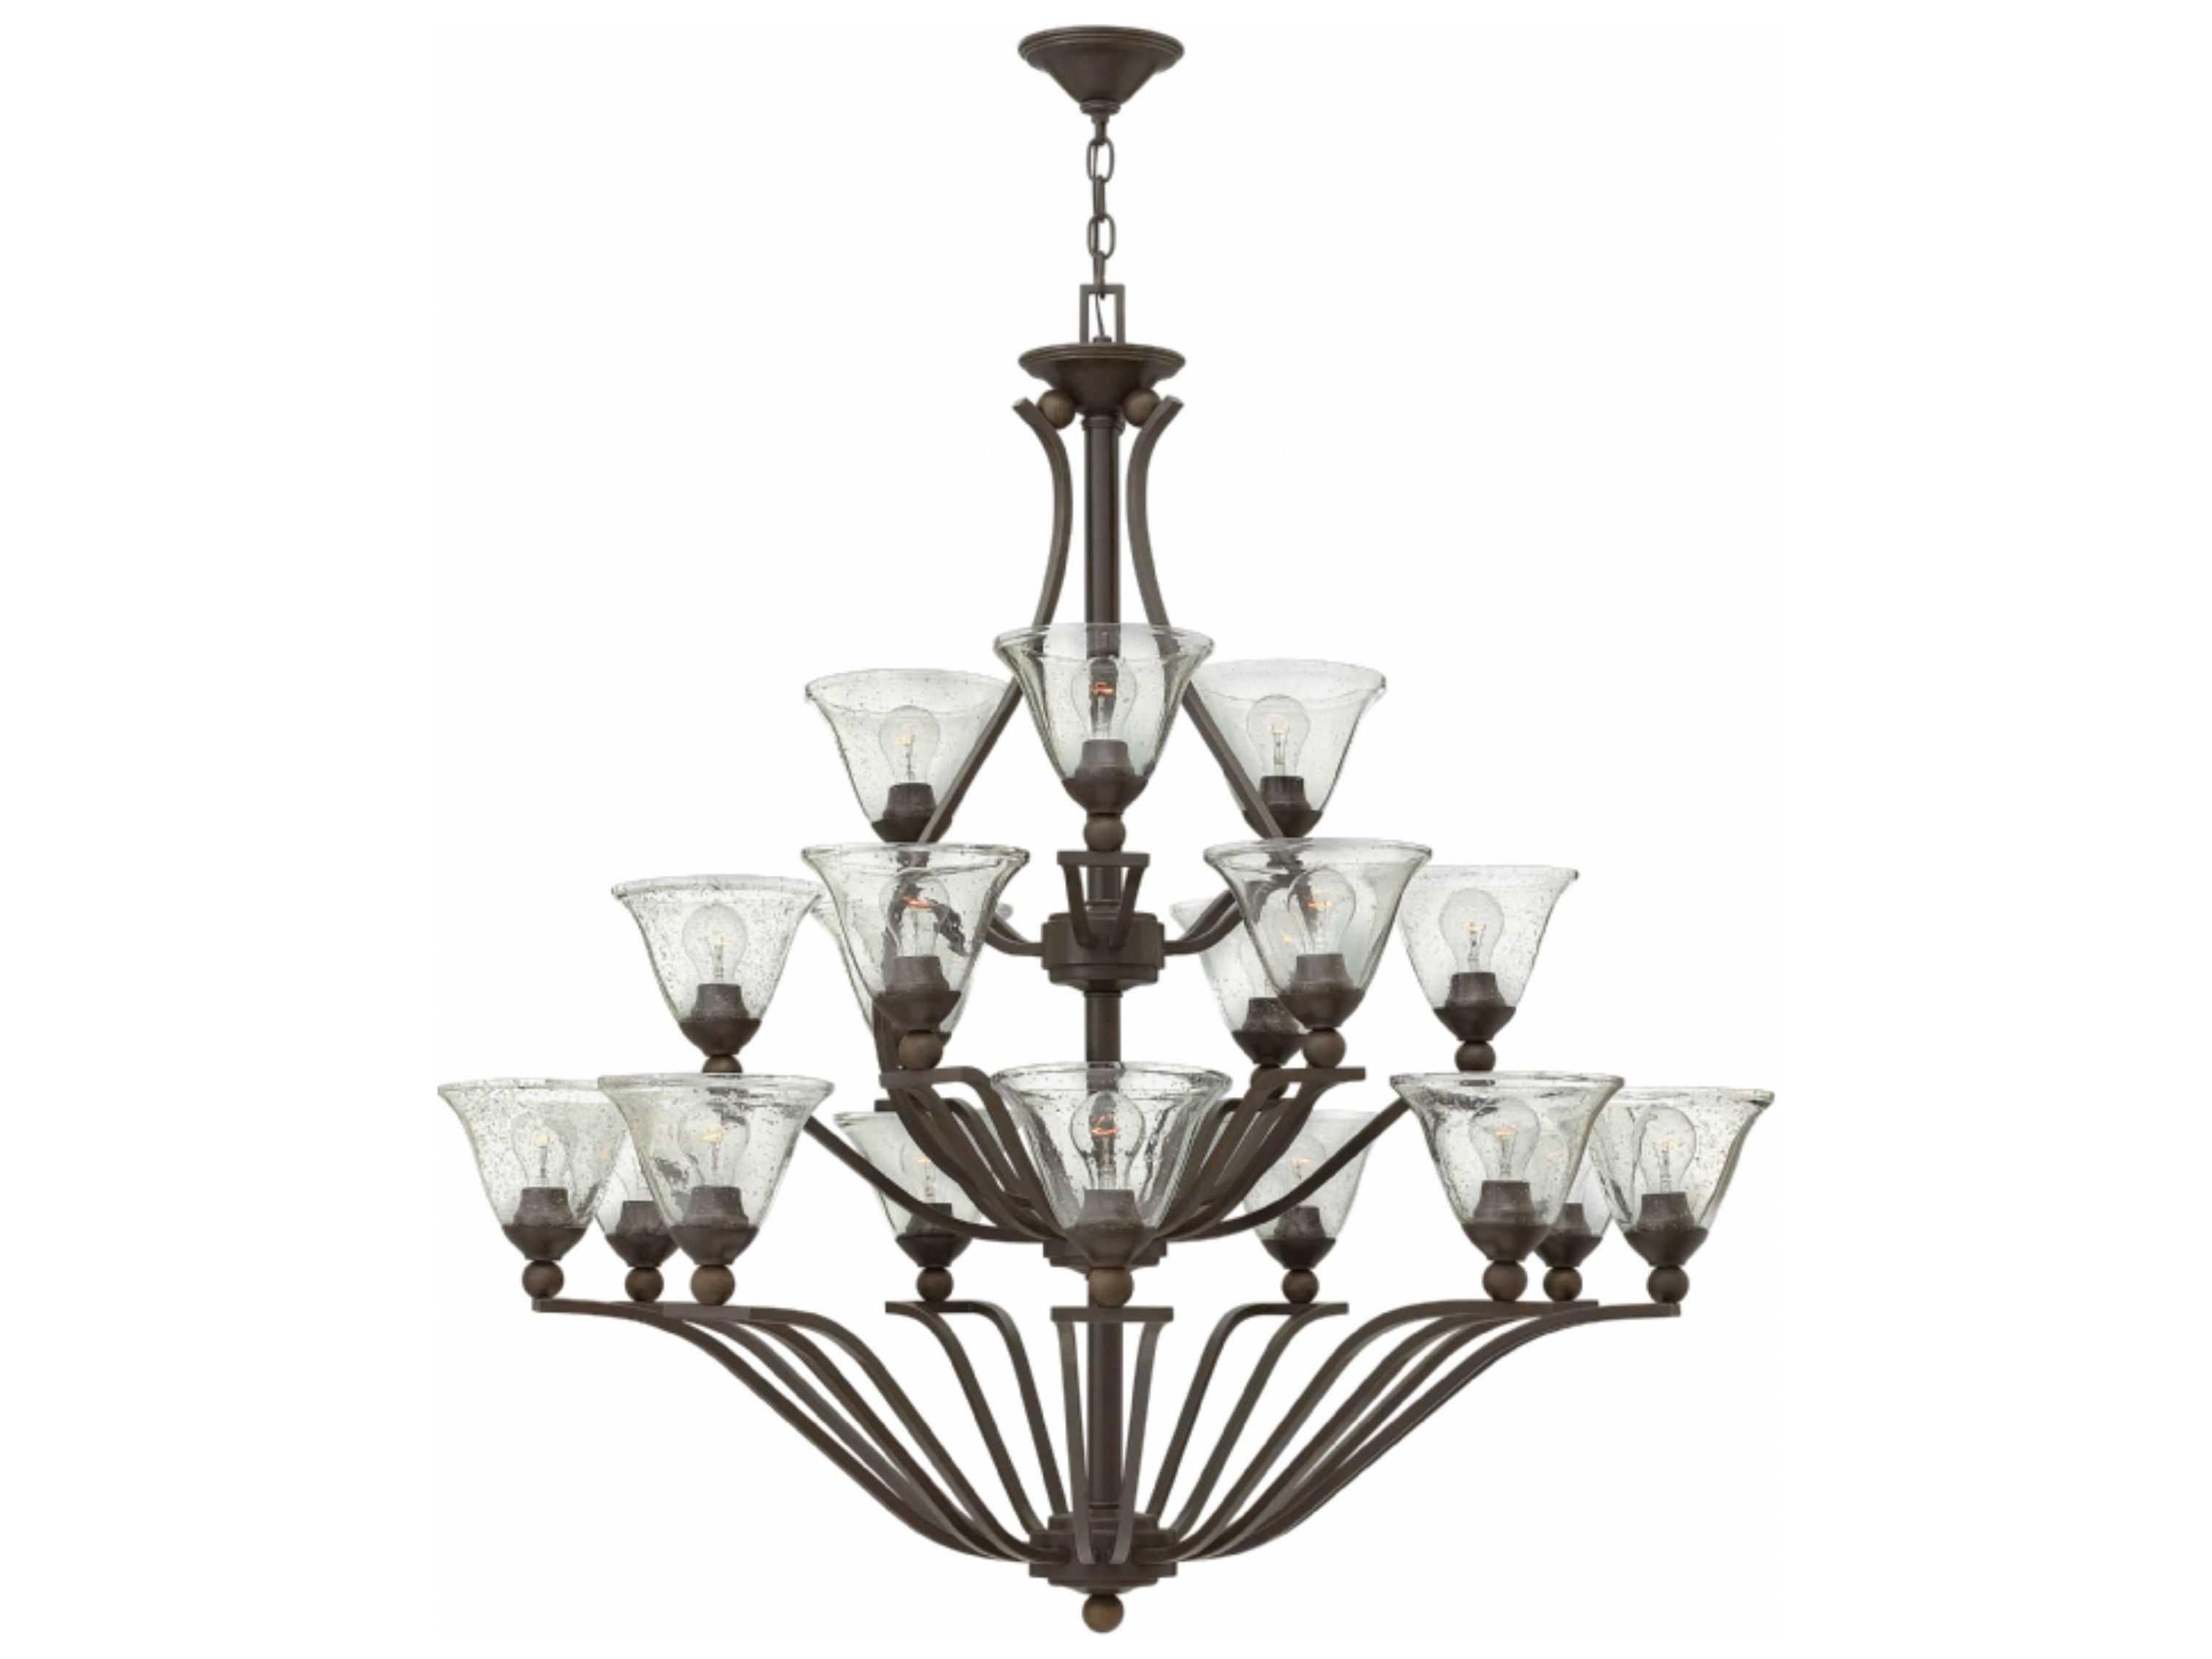 Hinkley Lighting Bolla Olde Bronze 18 Light 48 Wide